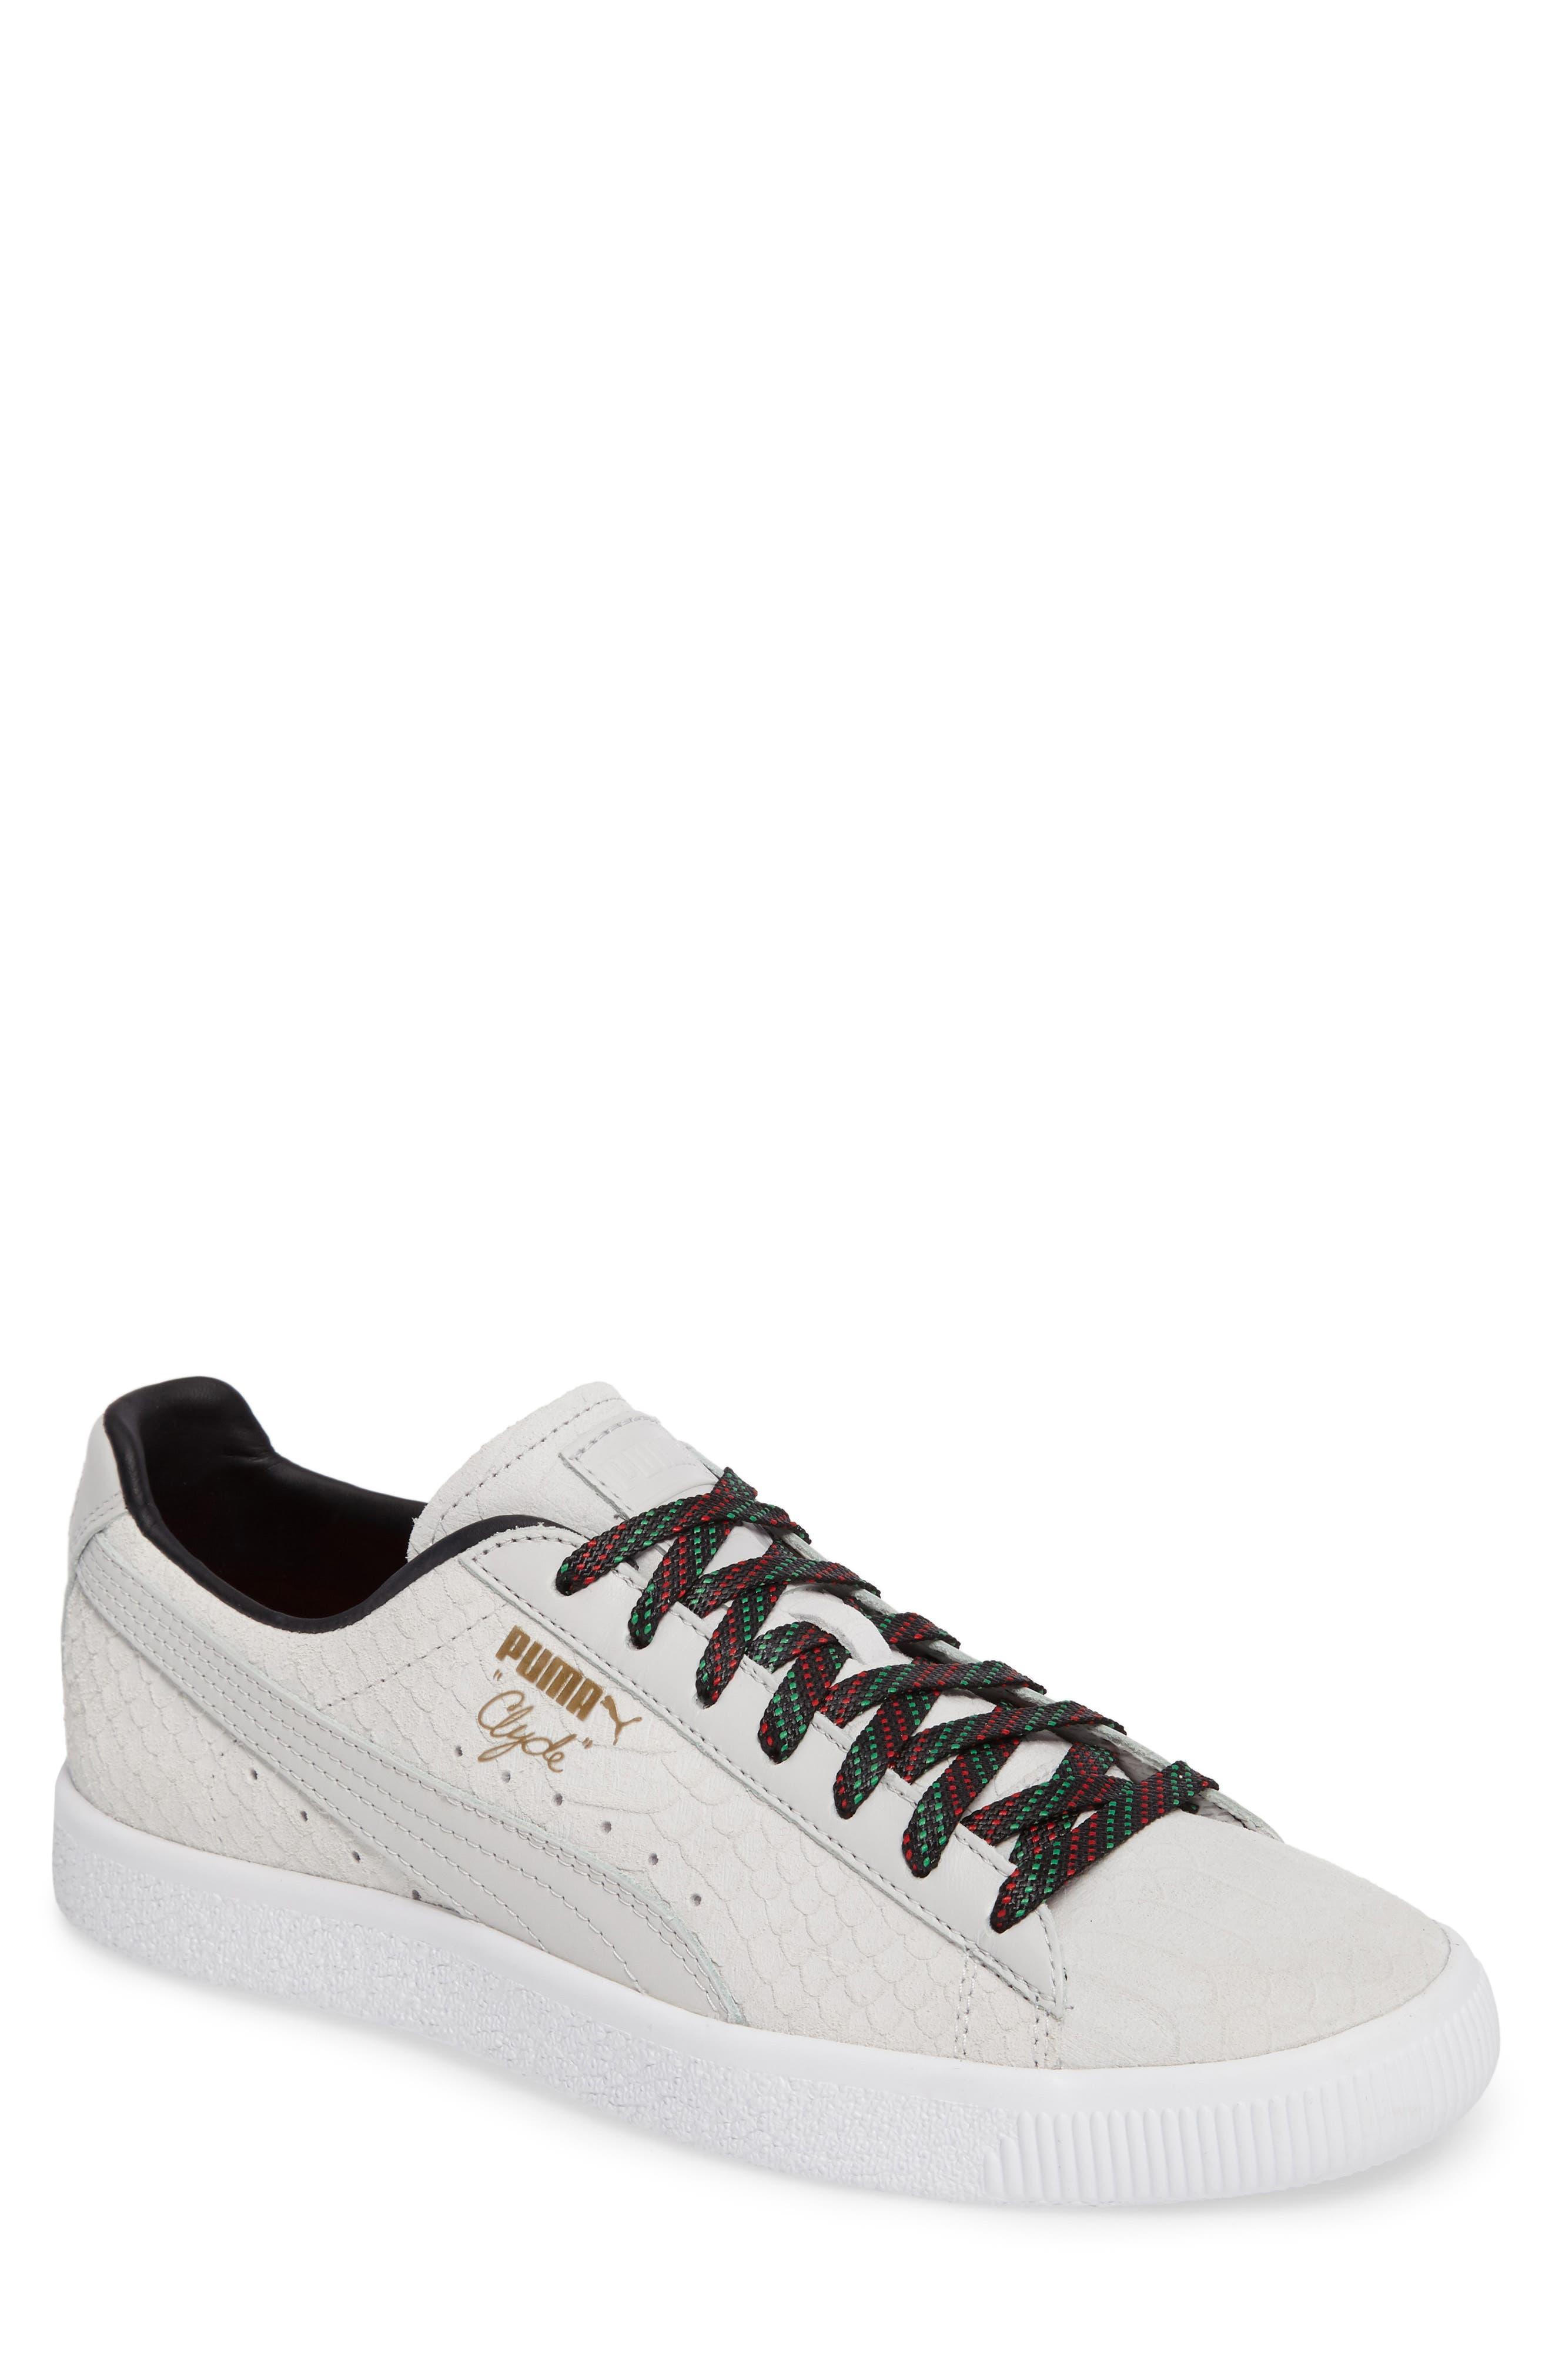 Clyde GCC Sneaker,                             Main thumbnail 1, color,                             White/ Puma Black